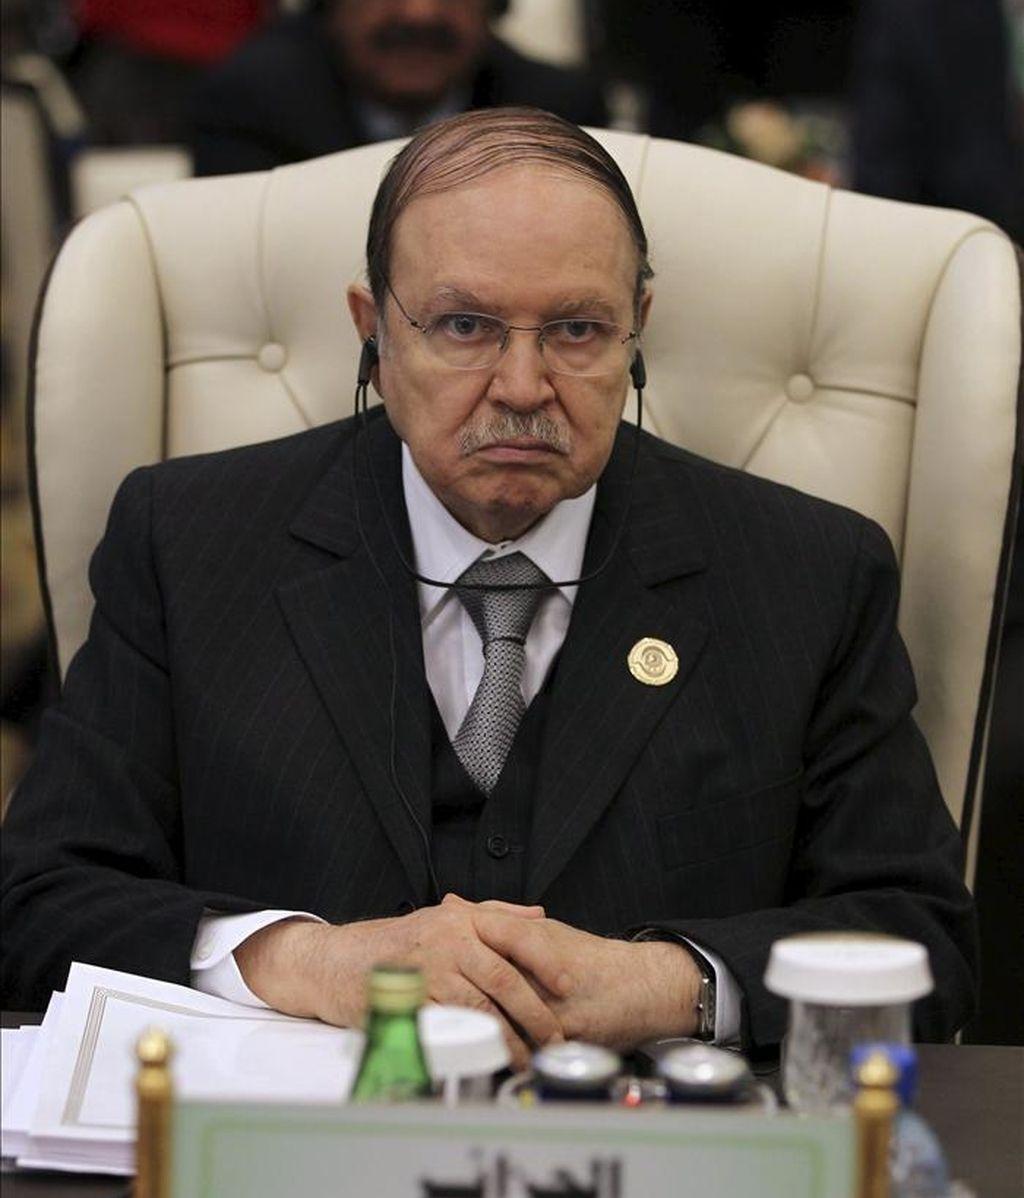 El presidente argelino, Abdelaziz Buteflika. EFE/Archivo